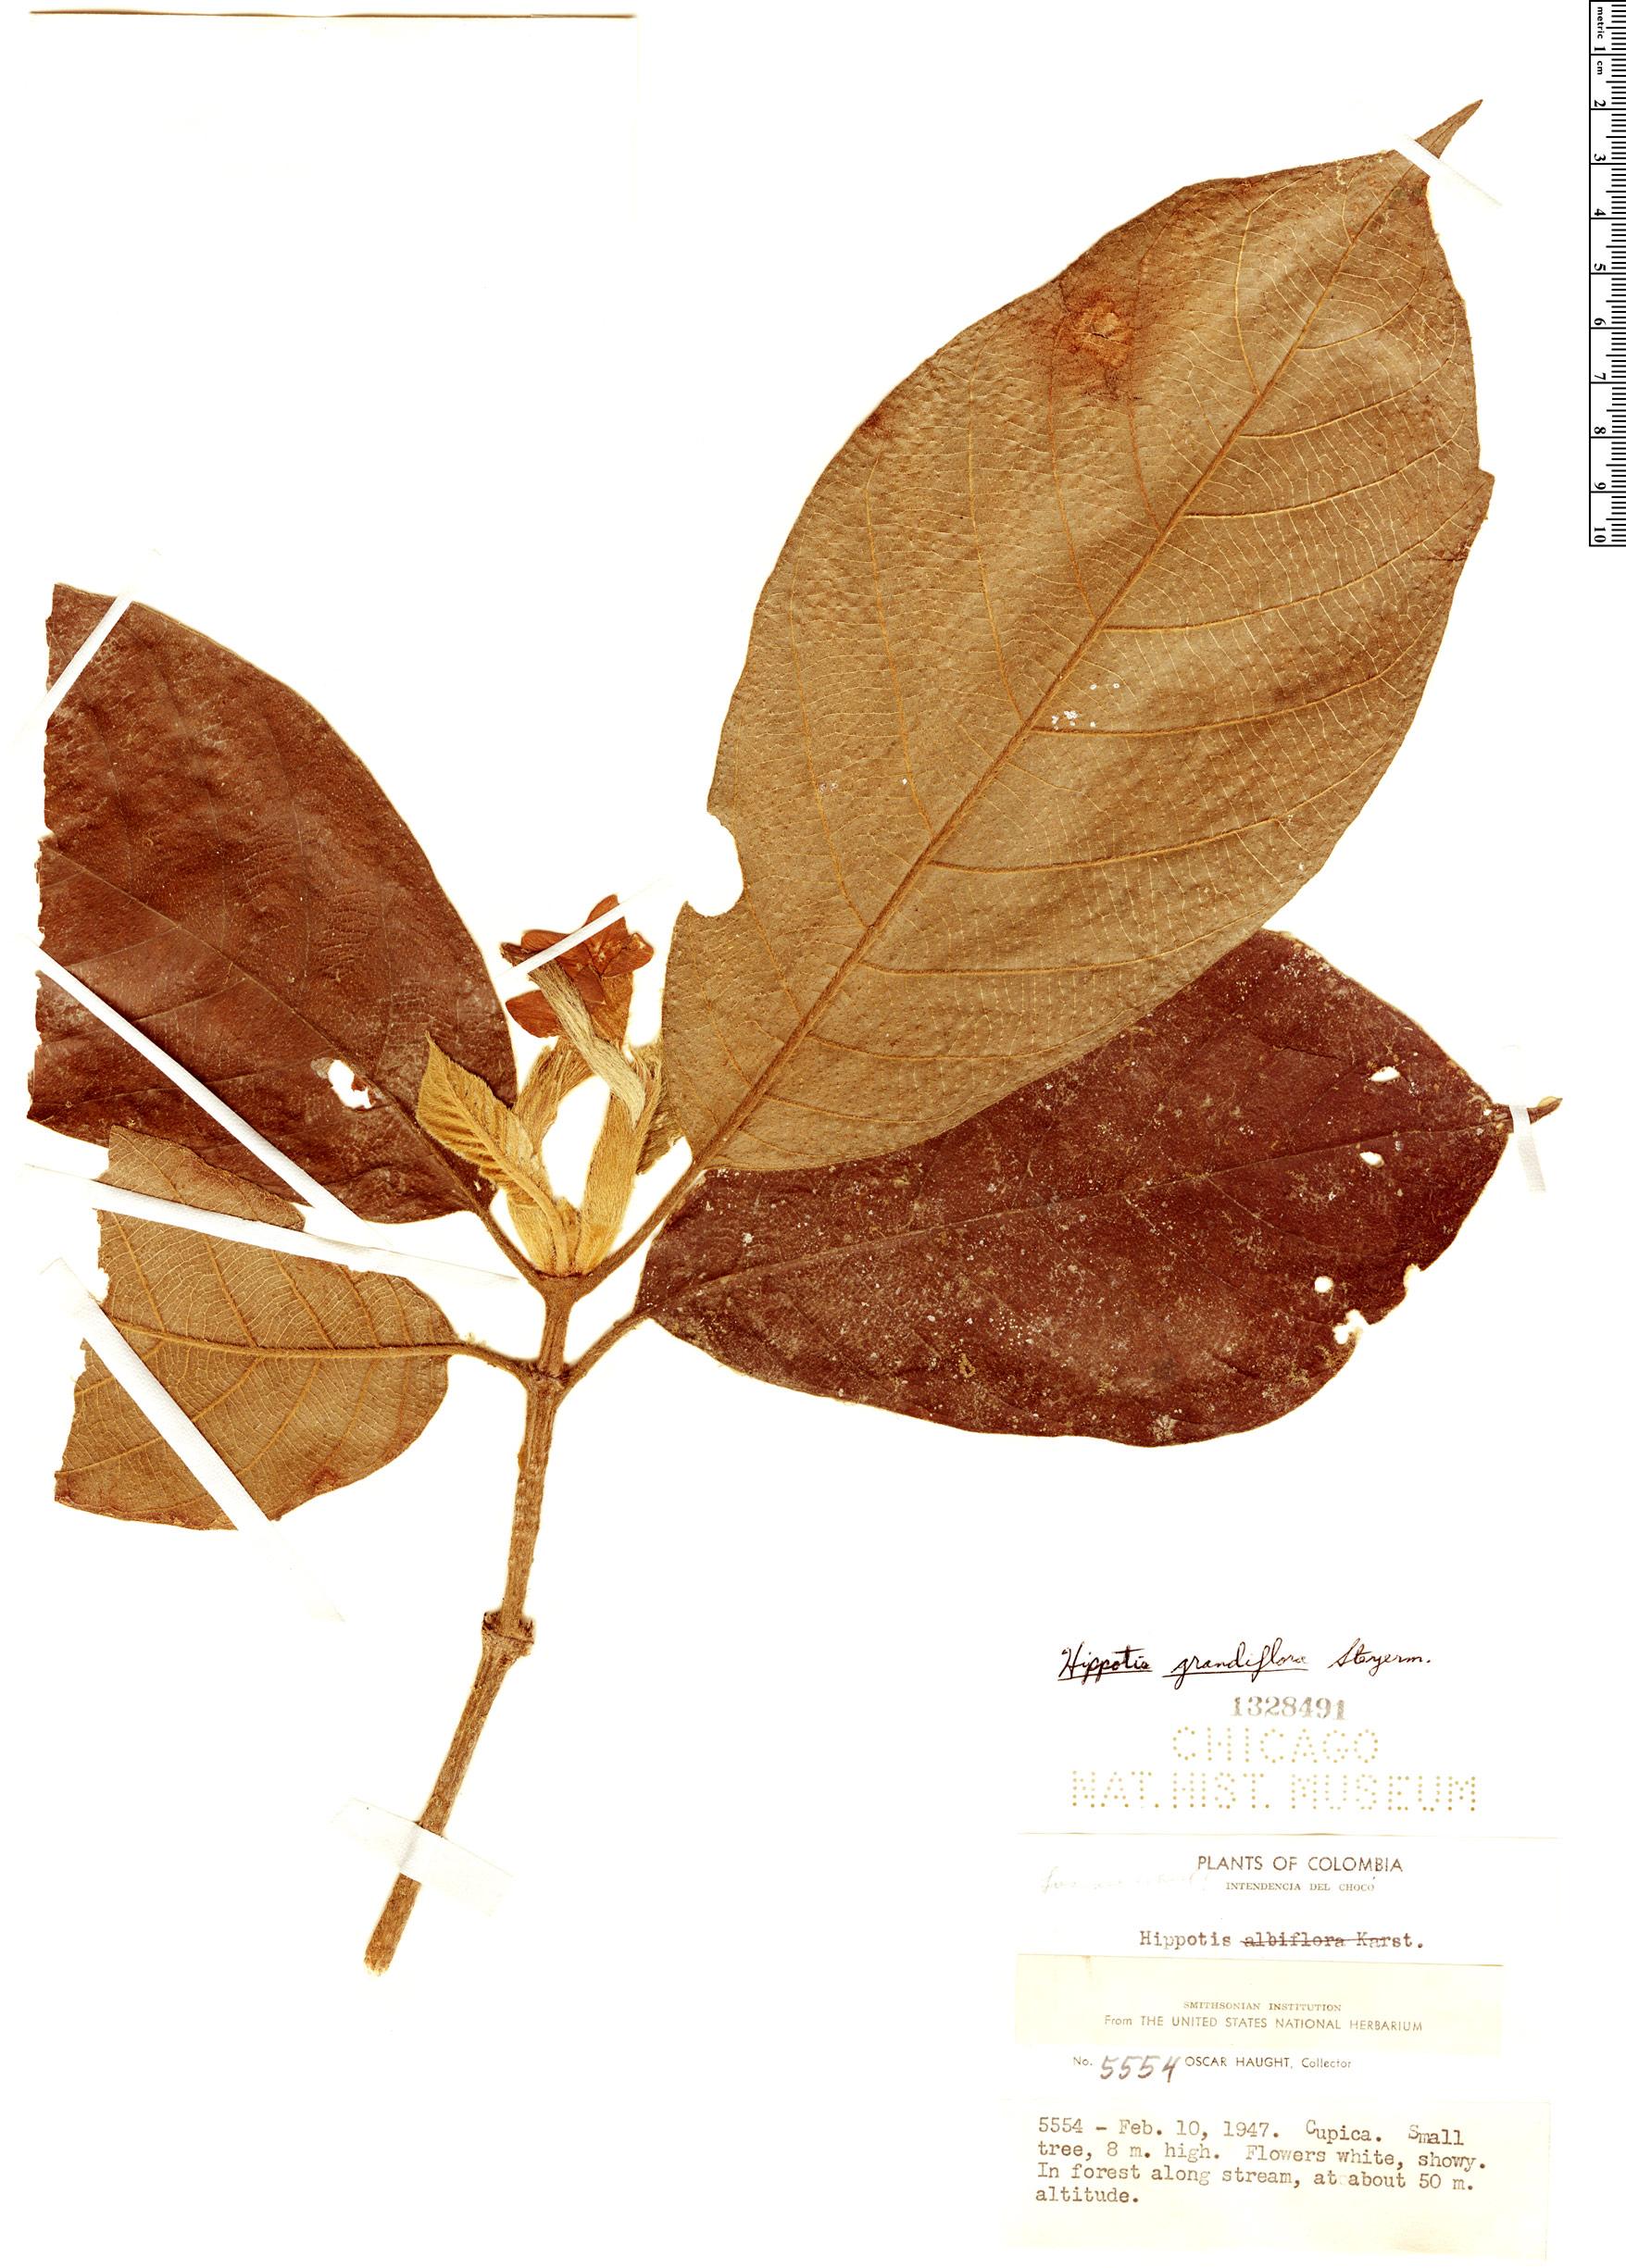 Specimen: Hippotis grandiflora